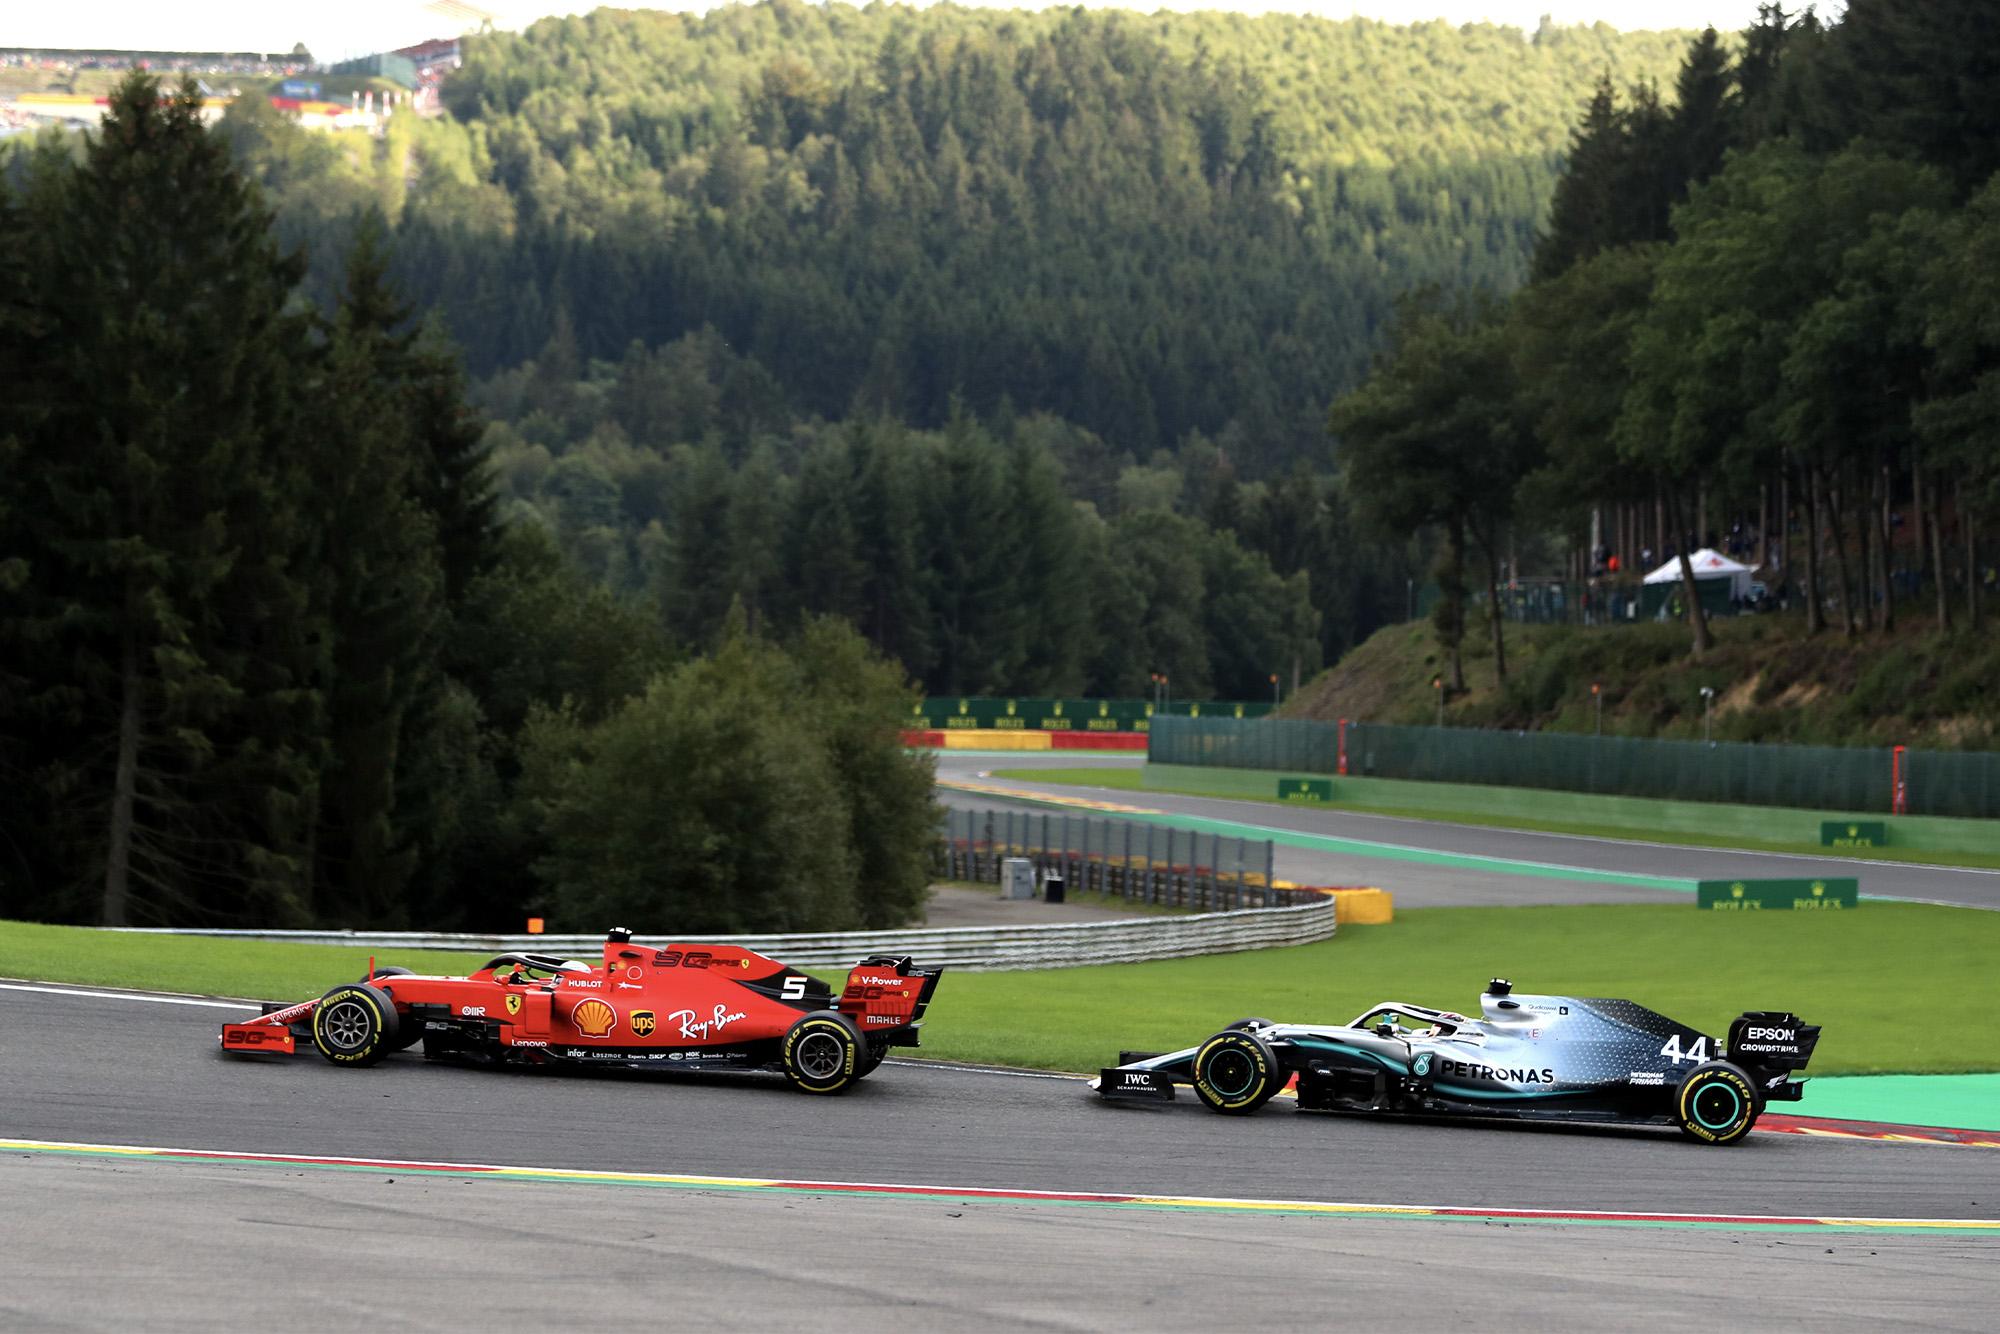 Sebastian Vettel and Lewis Hamilton during the 2019 Belgian Grand Prix